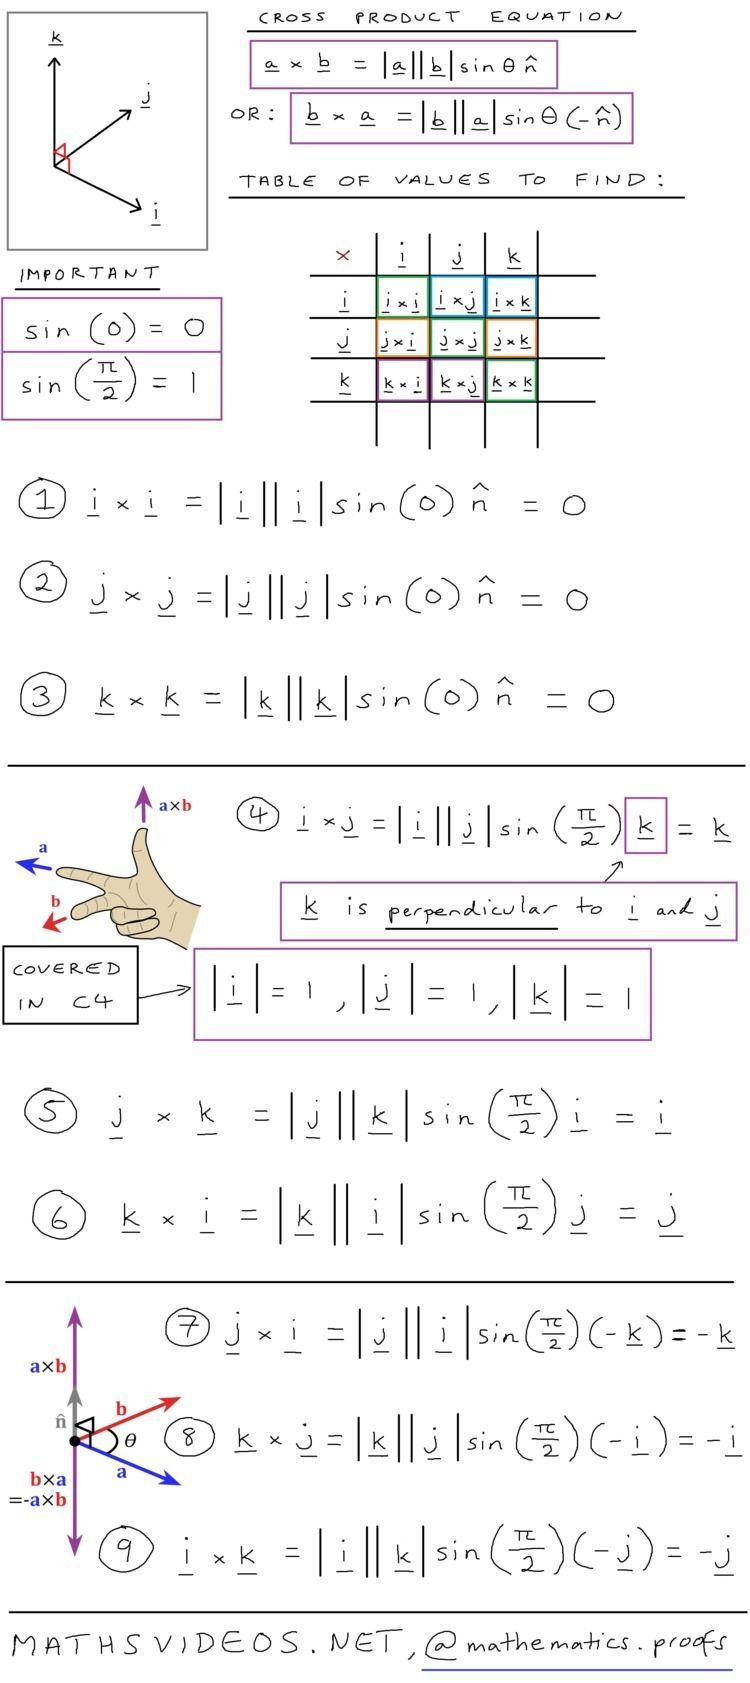 Finding values cross product te - tiago_hands | ello